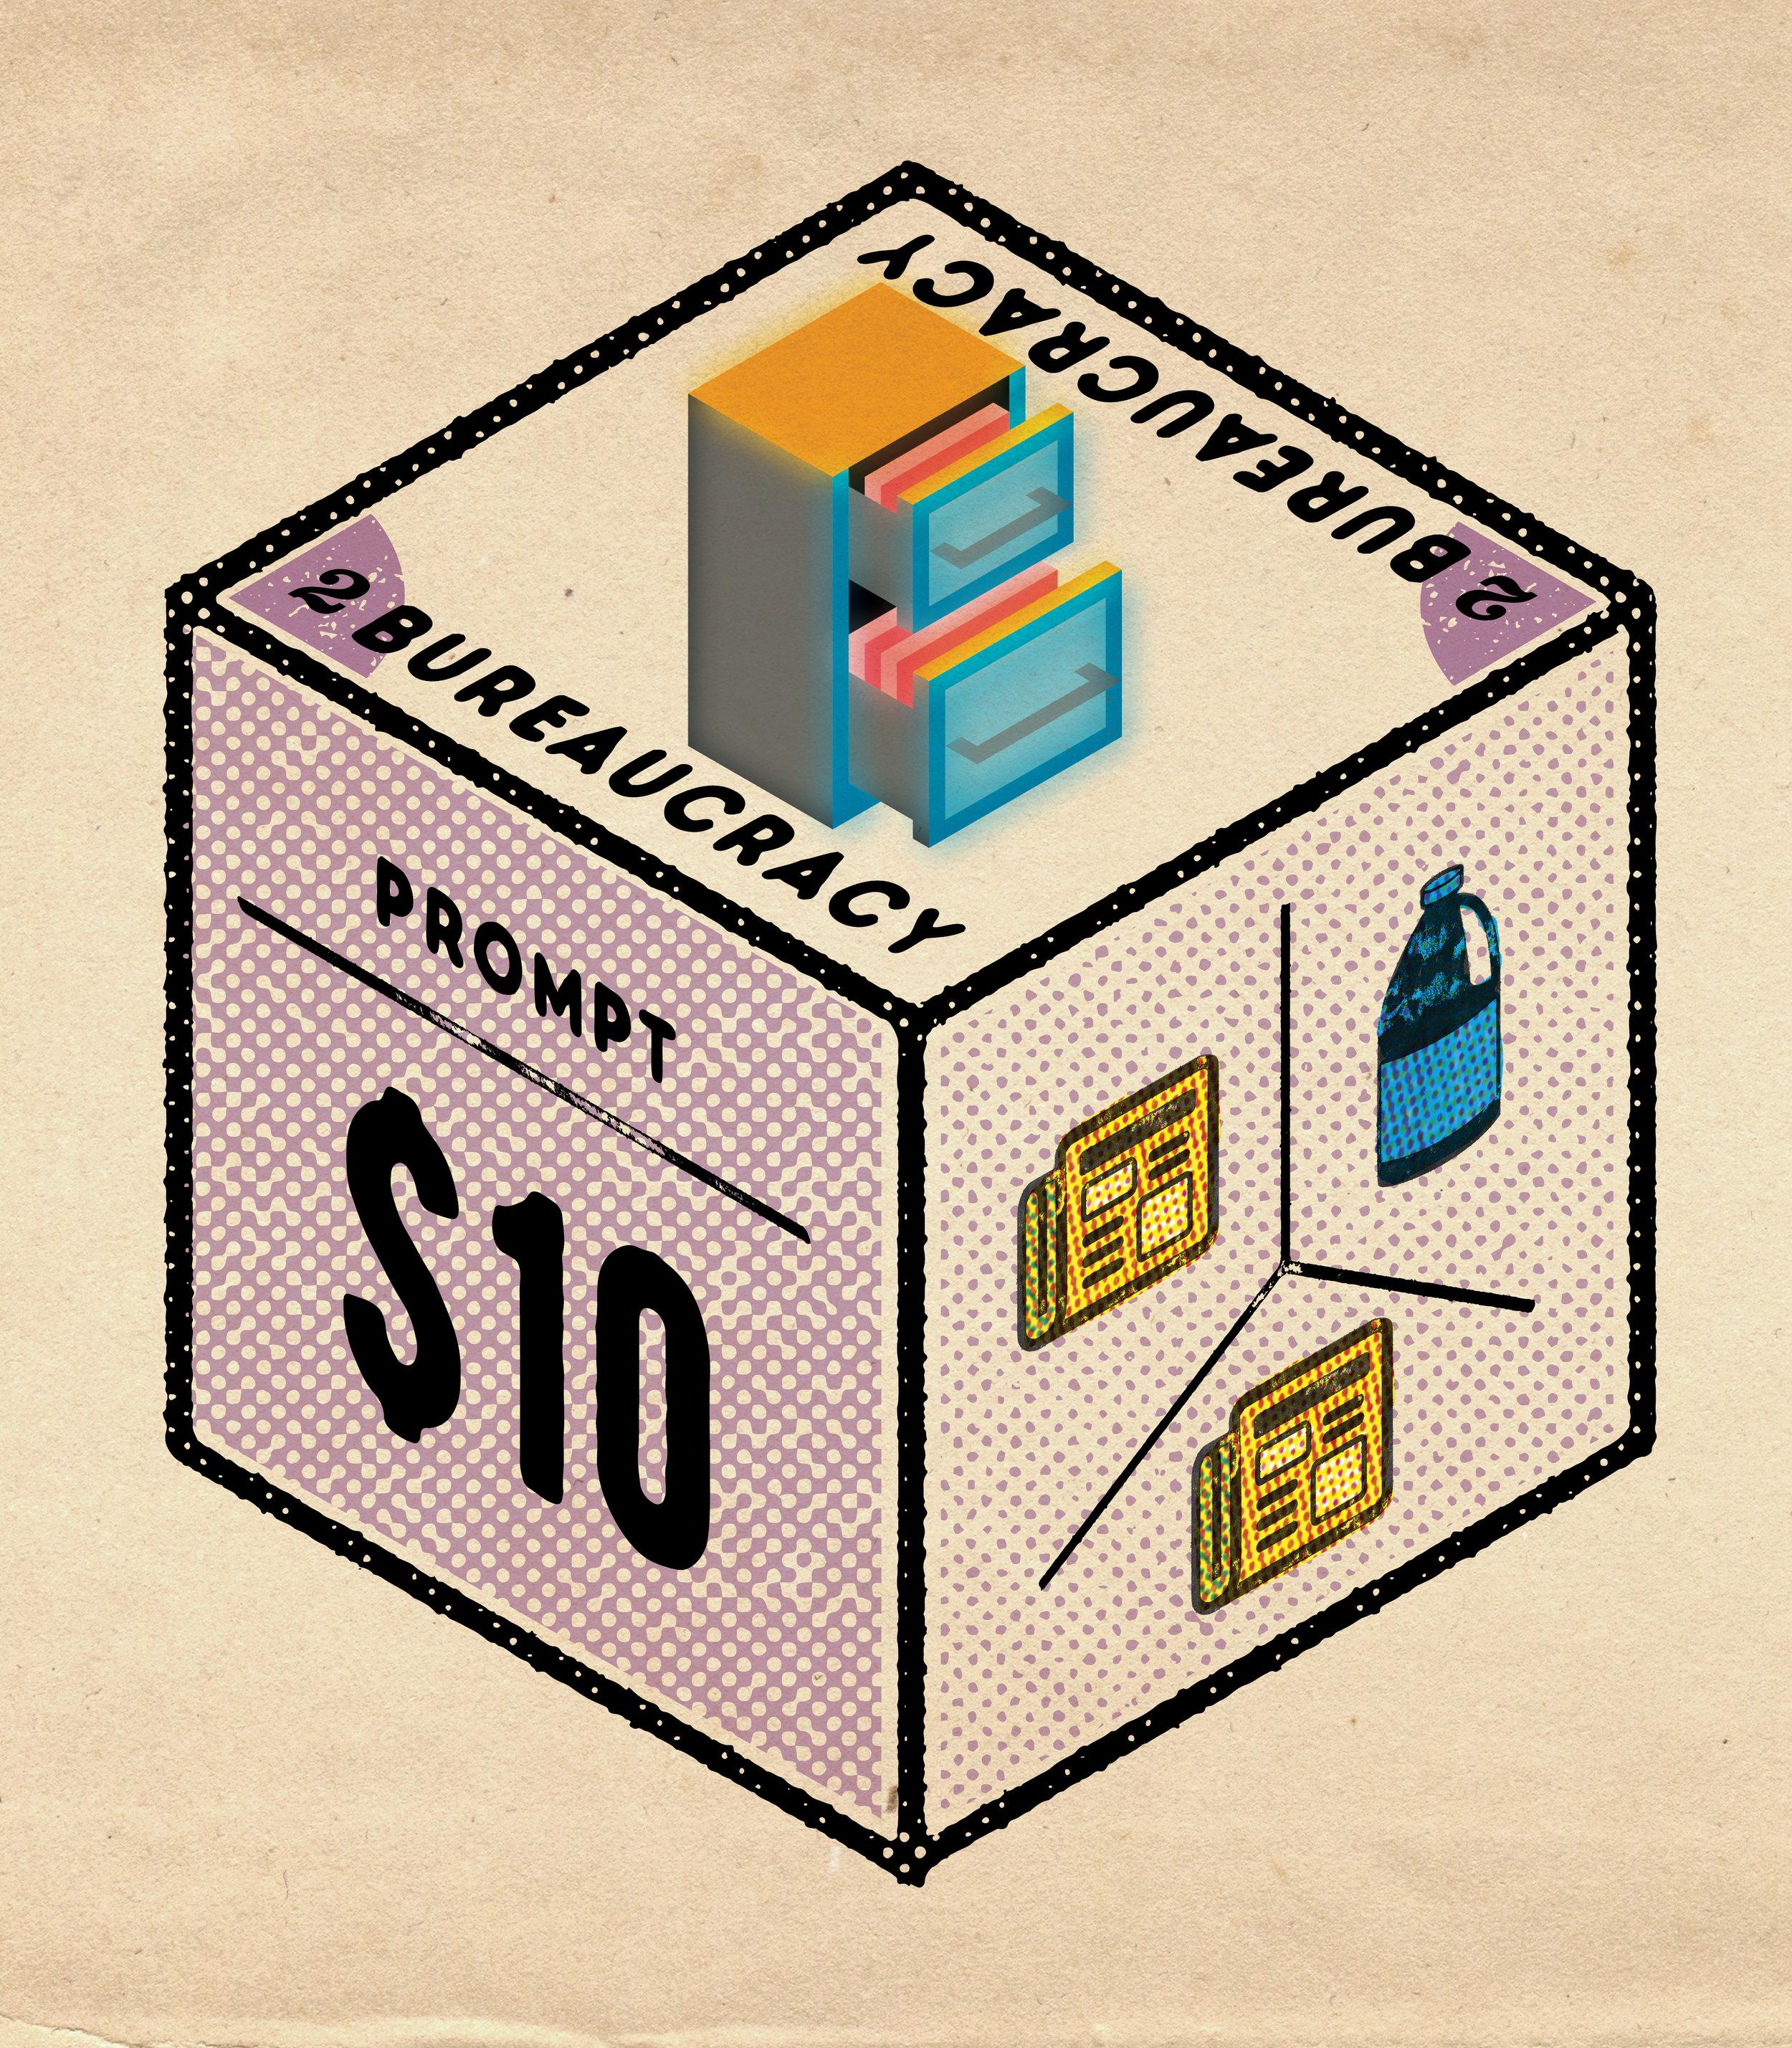 Hed Card Layouts v5 - Cardback Choice14.jpg